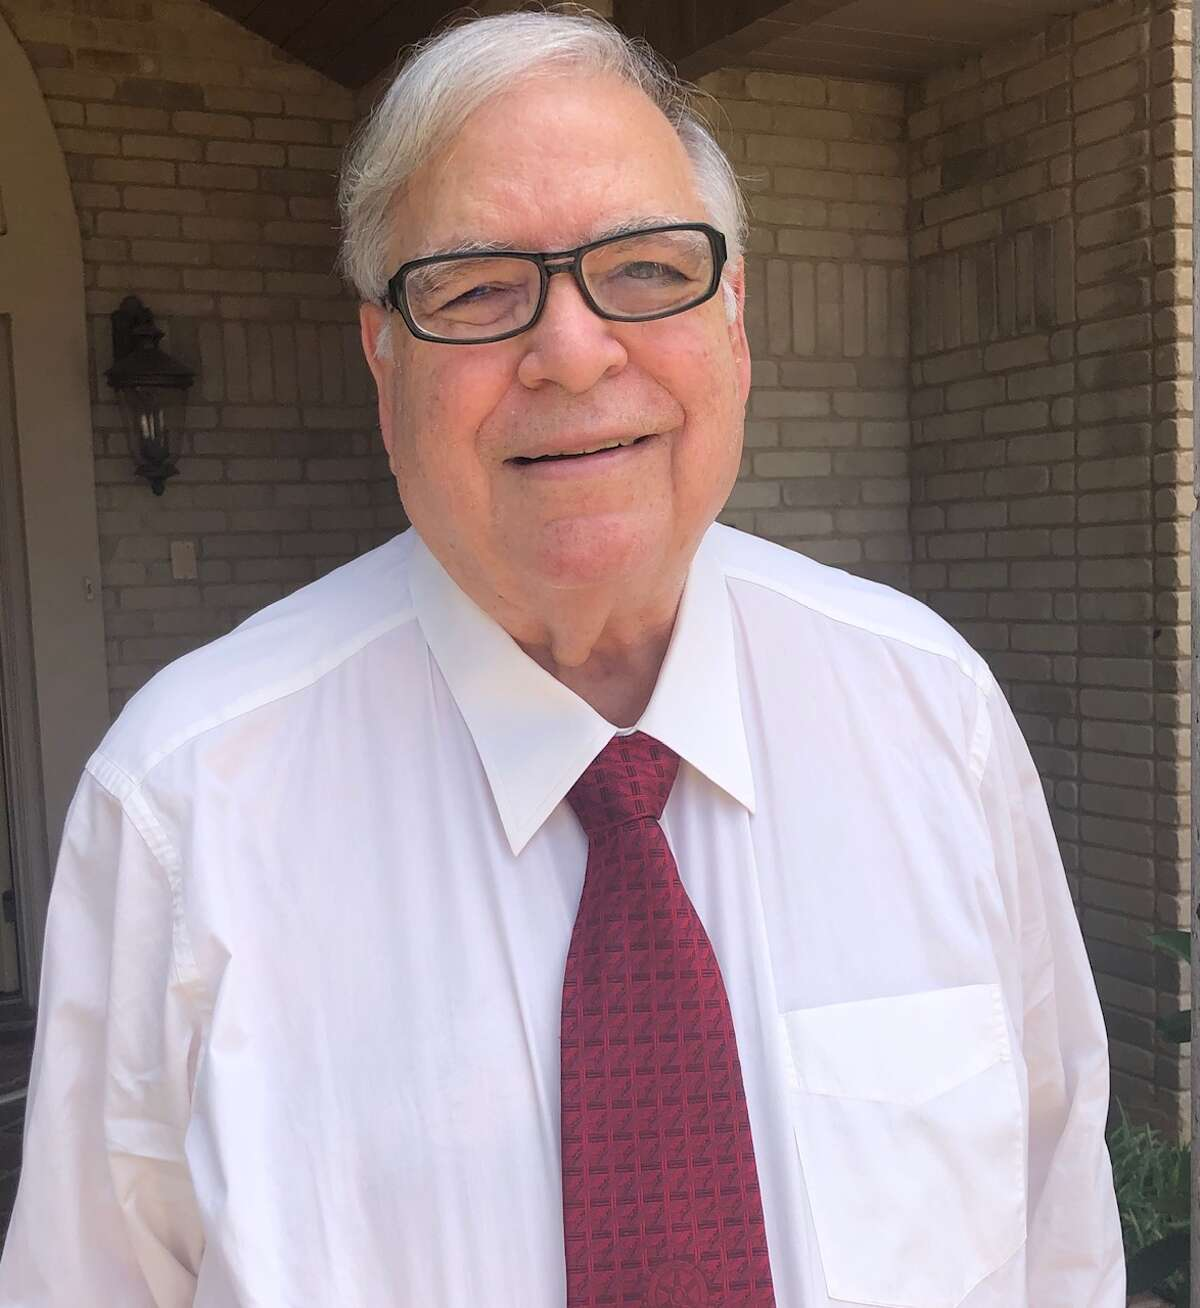 Fernando D. Cuellar